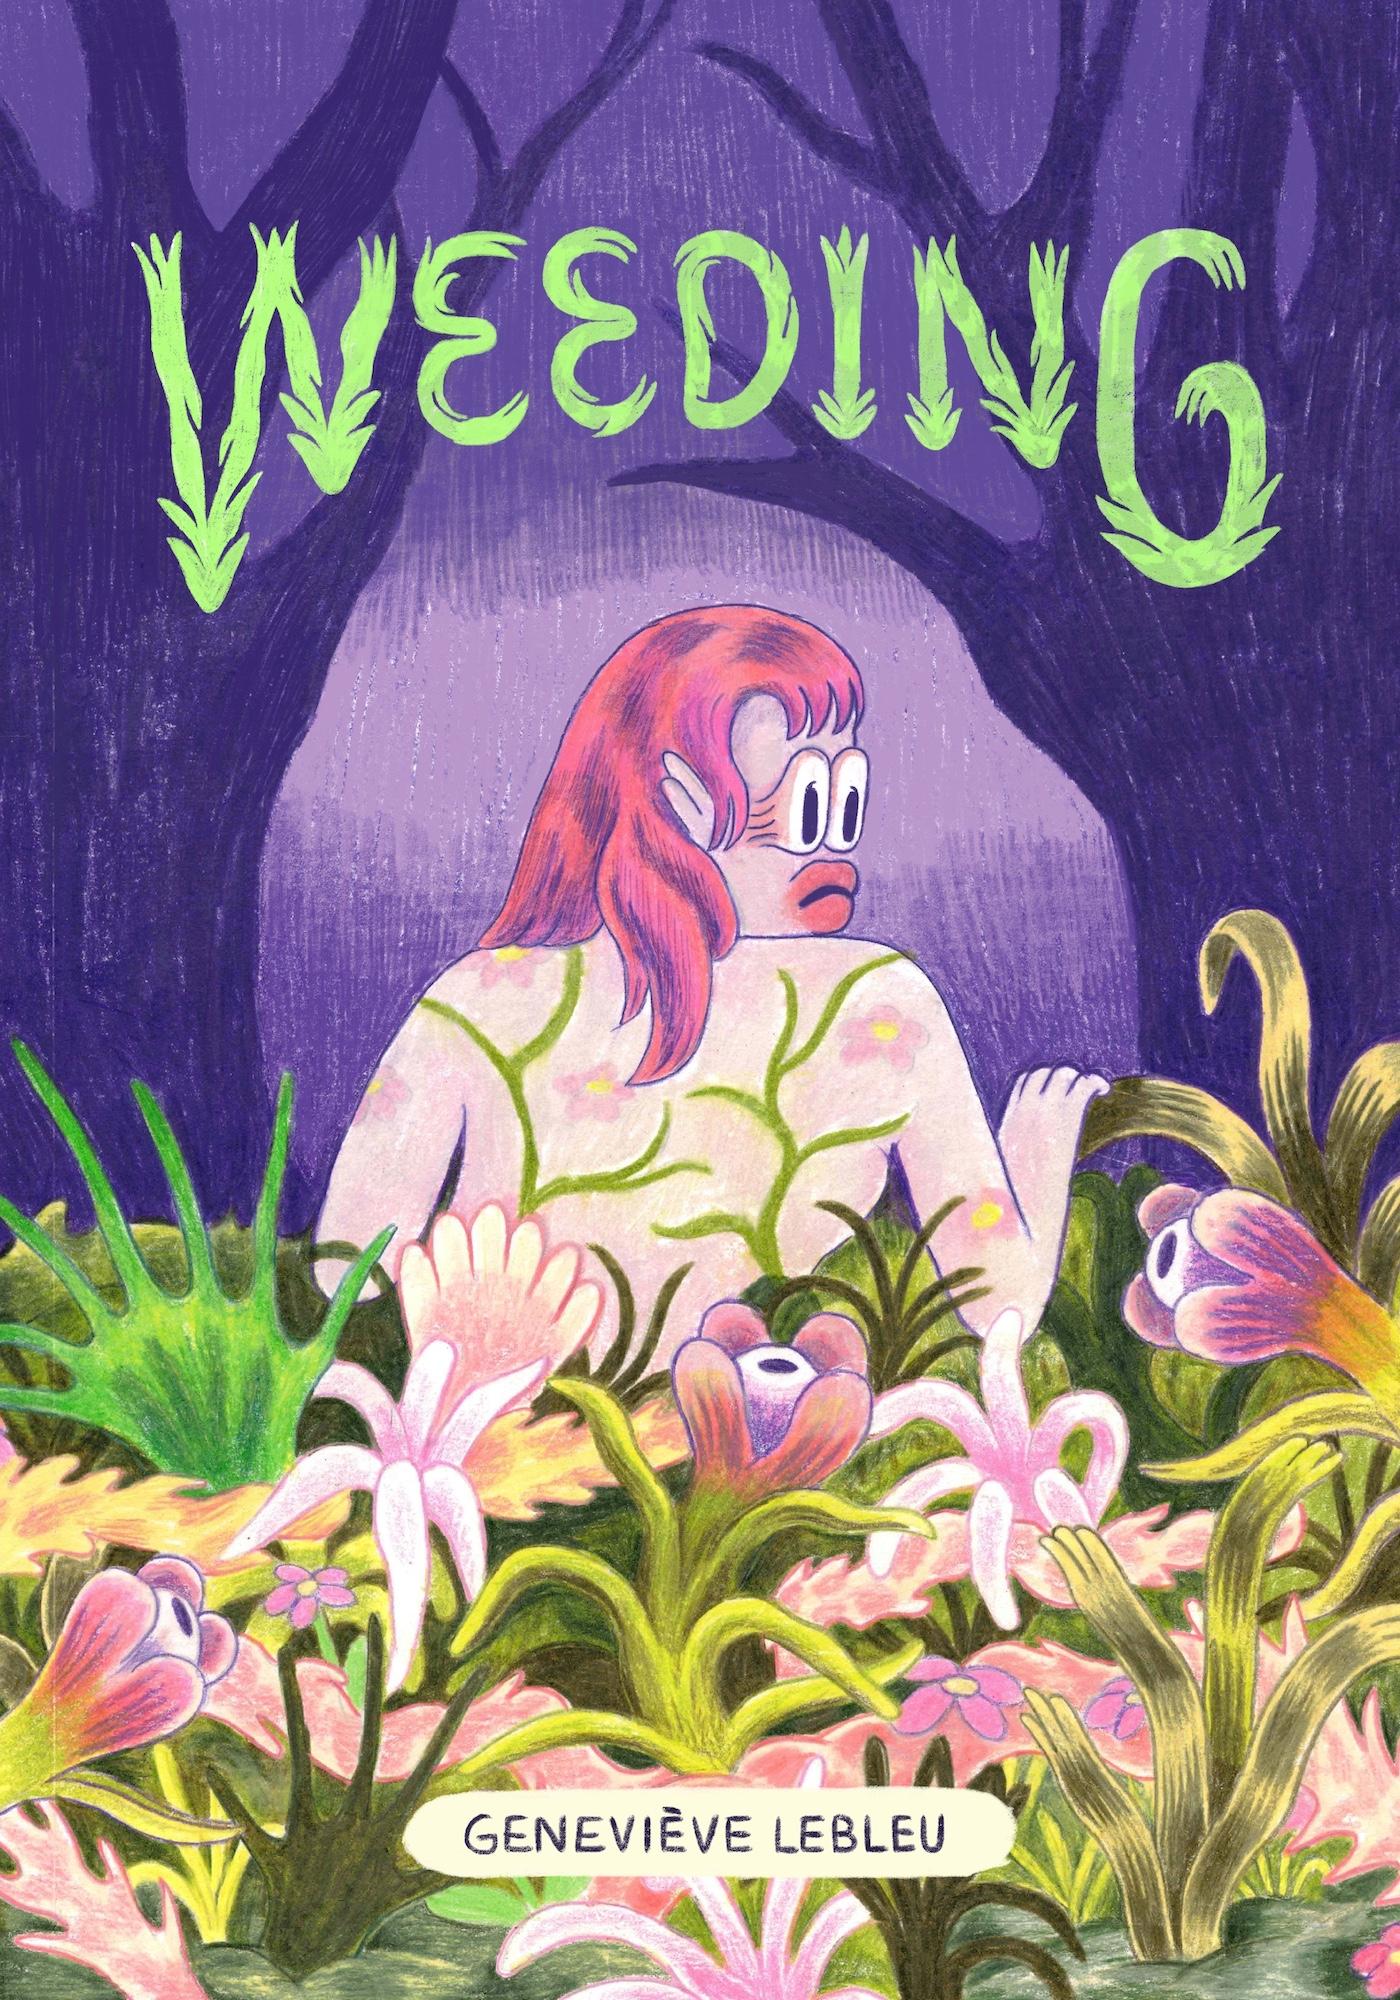 Weeding_000_cover copy